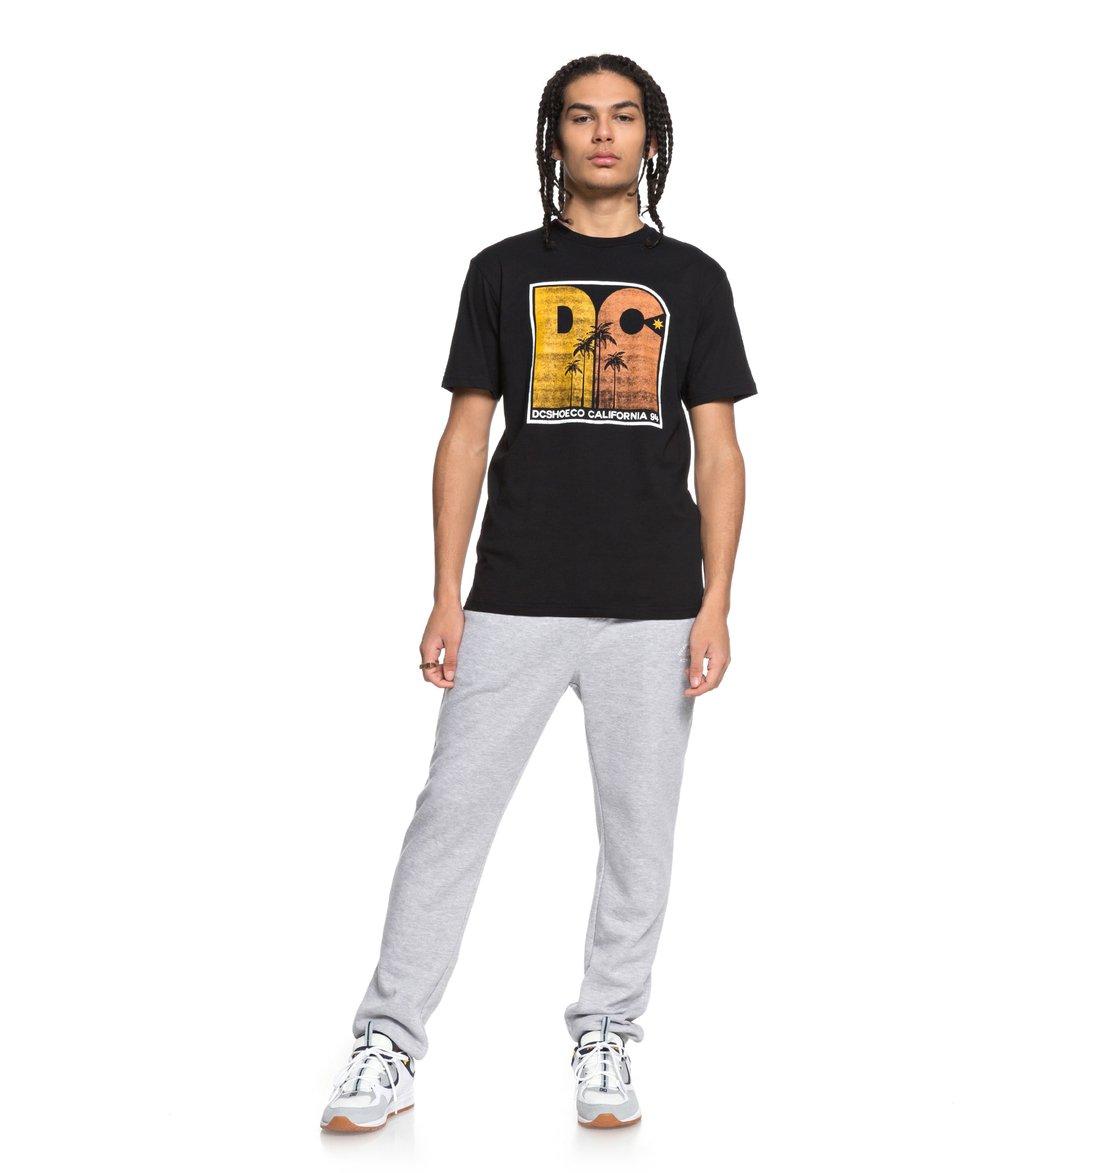 DC-Shoes-Sunset-Palms-Camiseta-para-Hombre-EDYZT03767 miniatura 8